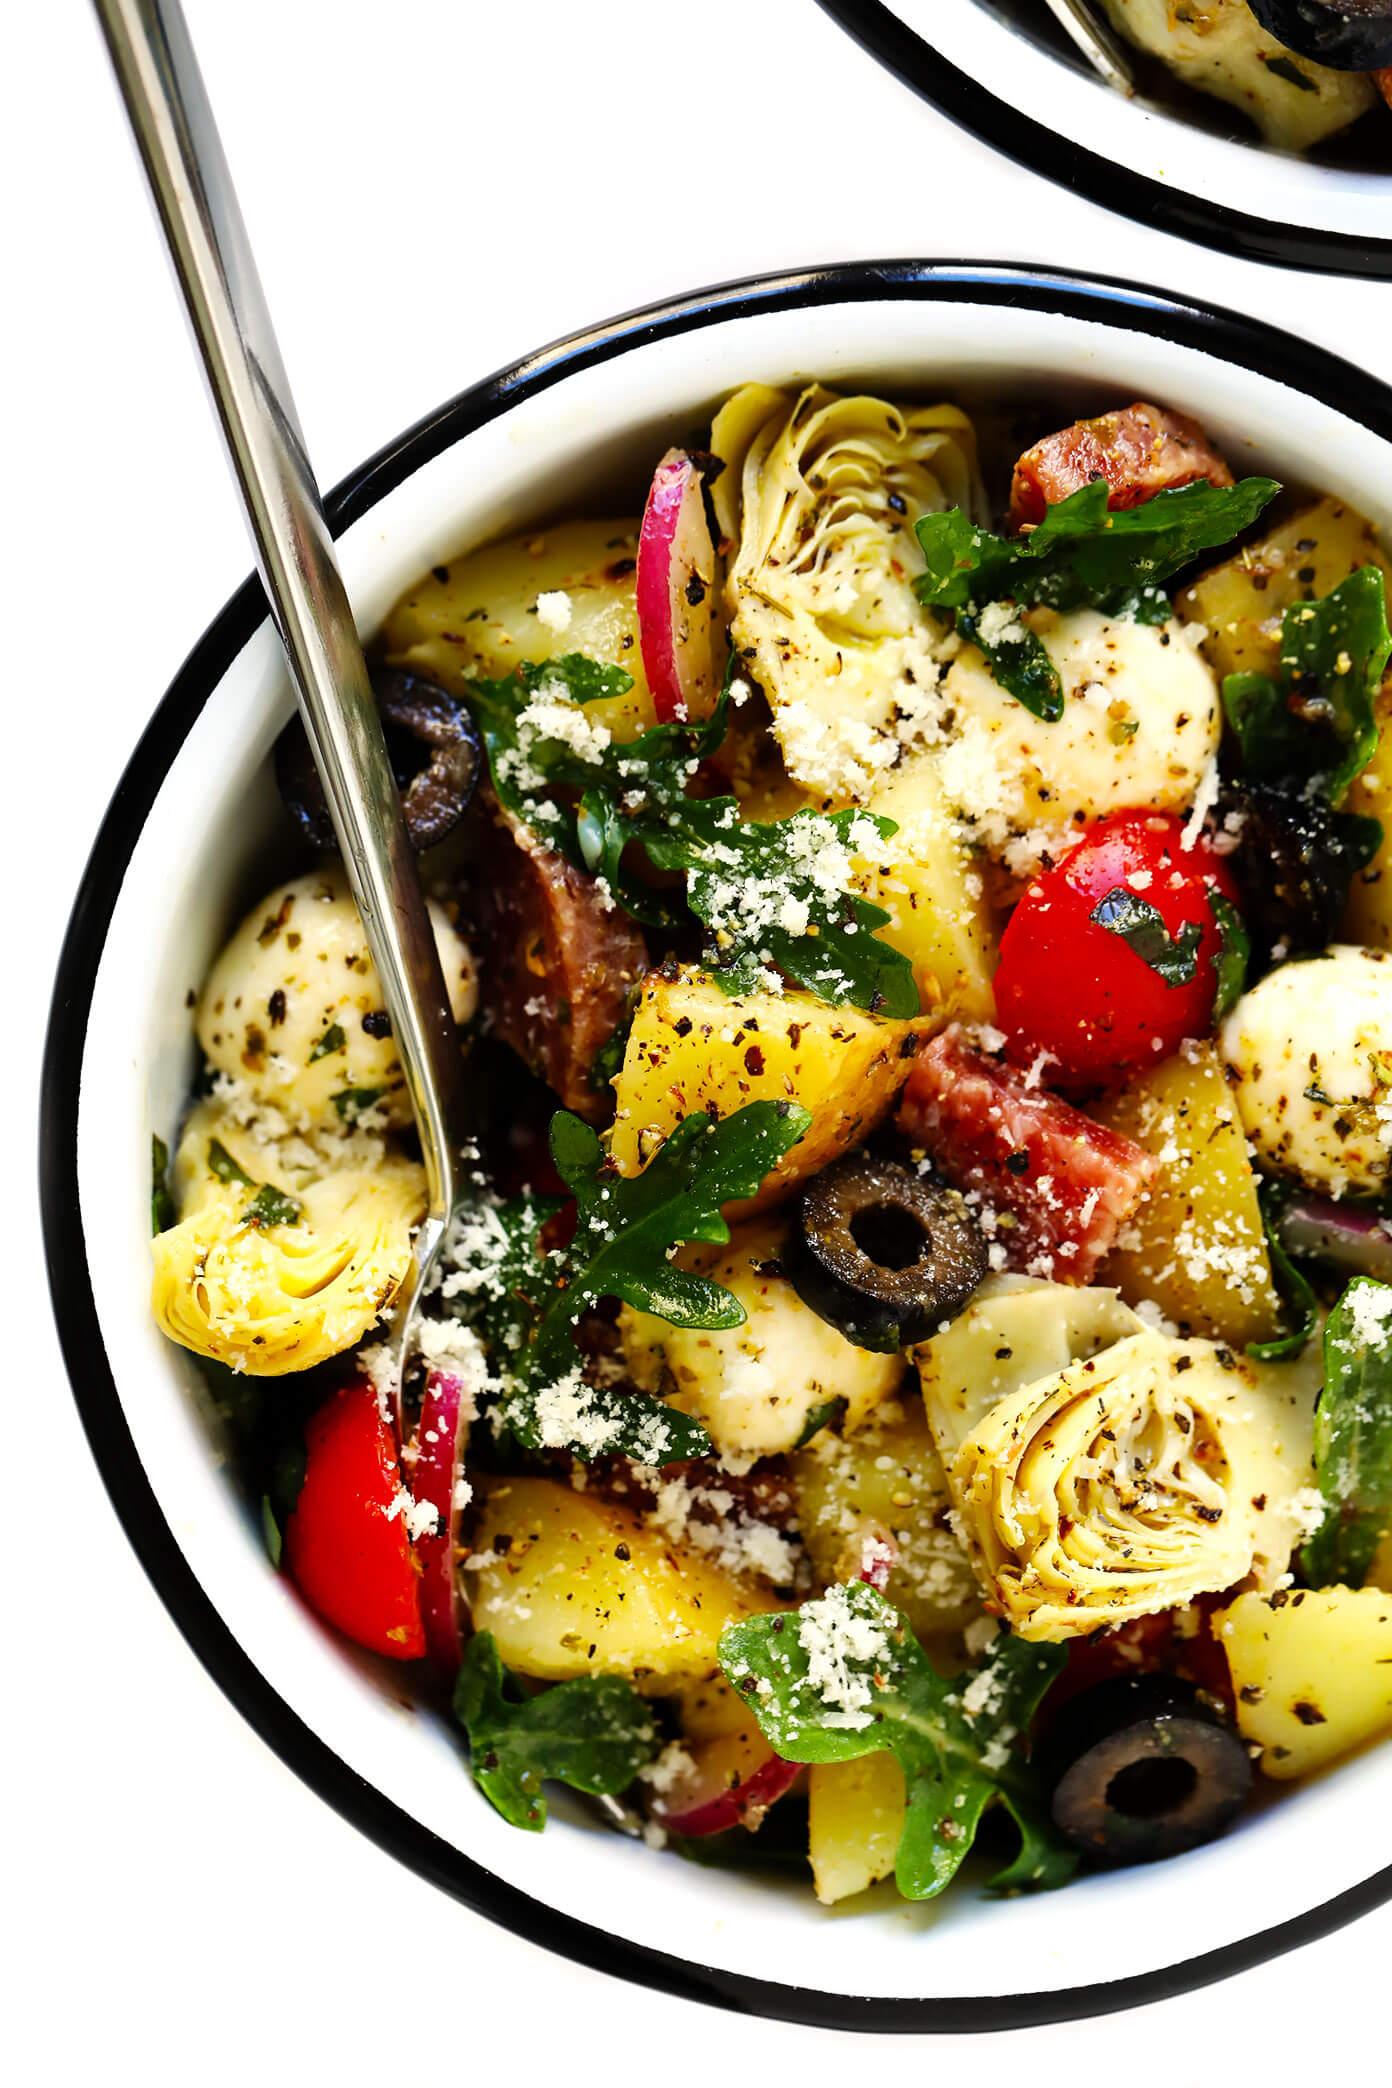 Potato Salad with Italian Dressing